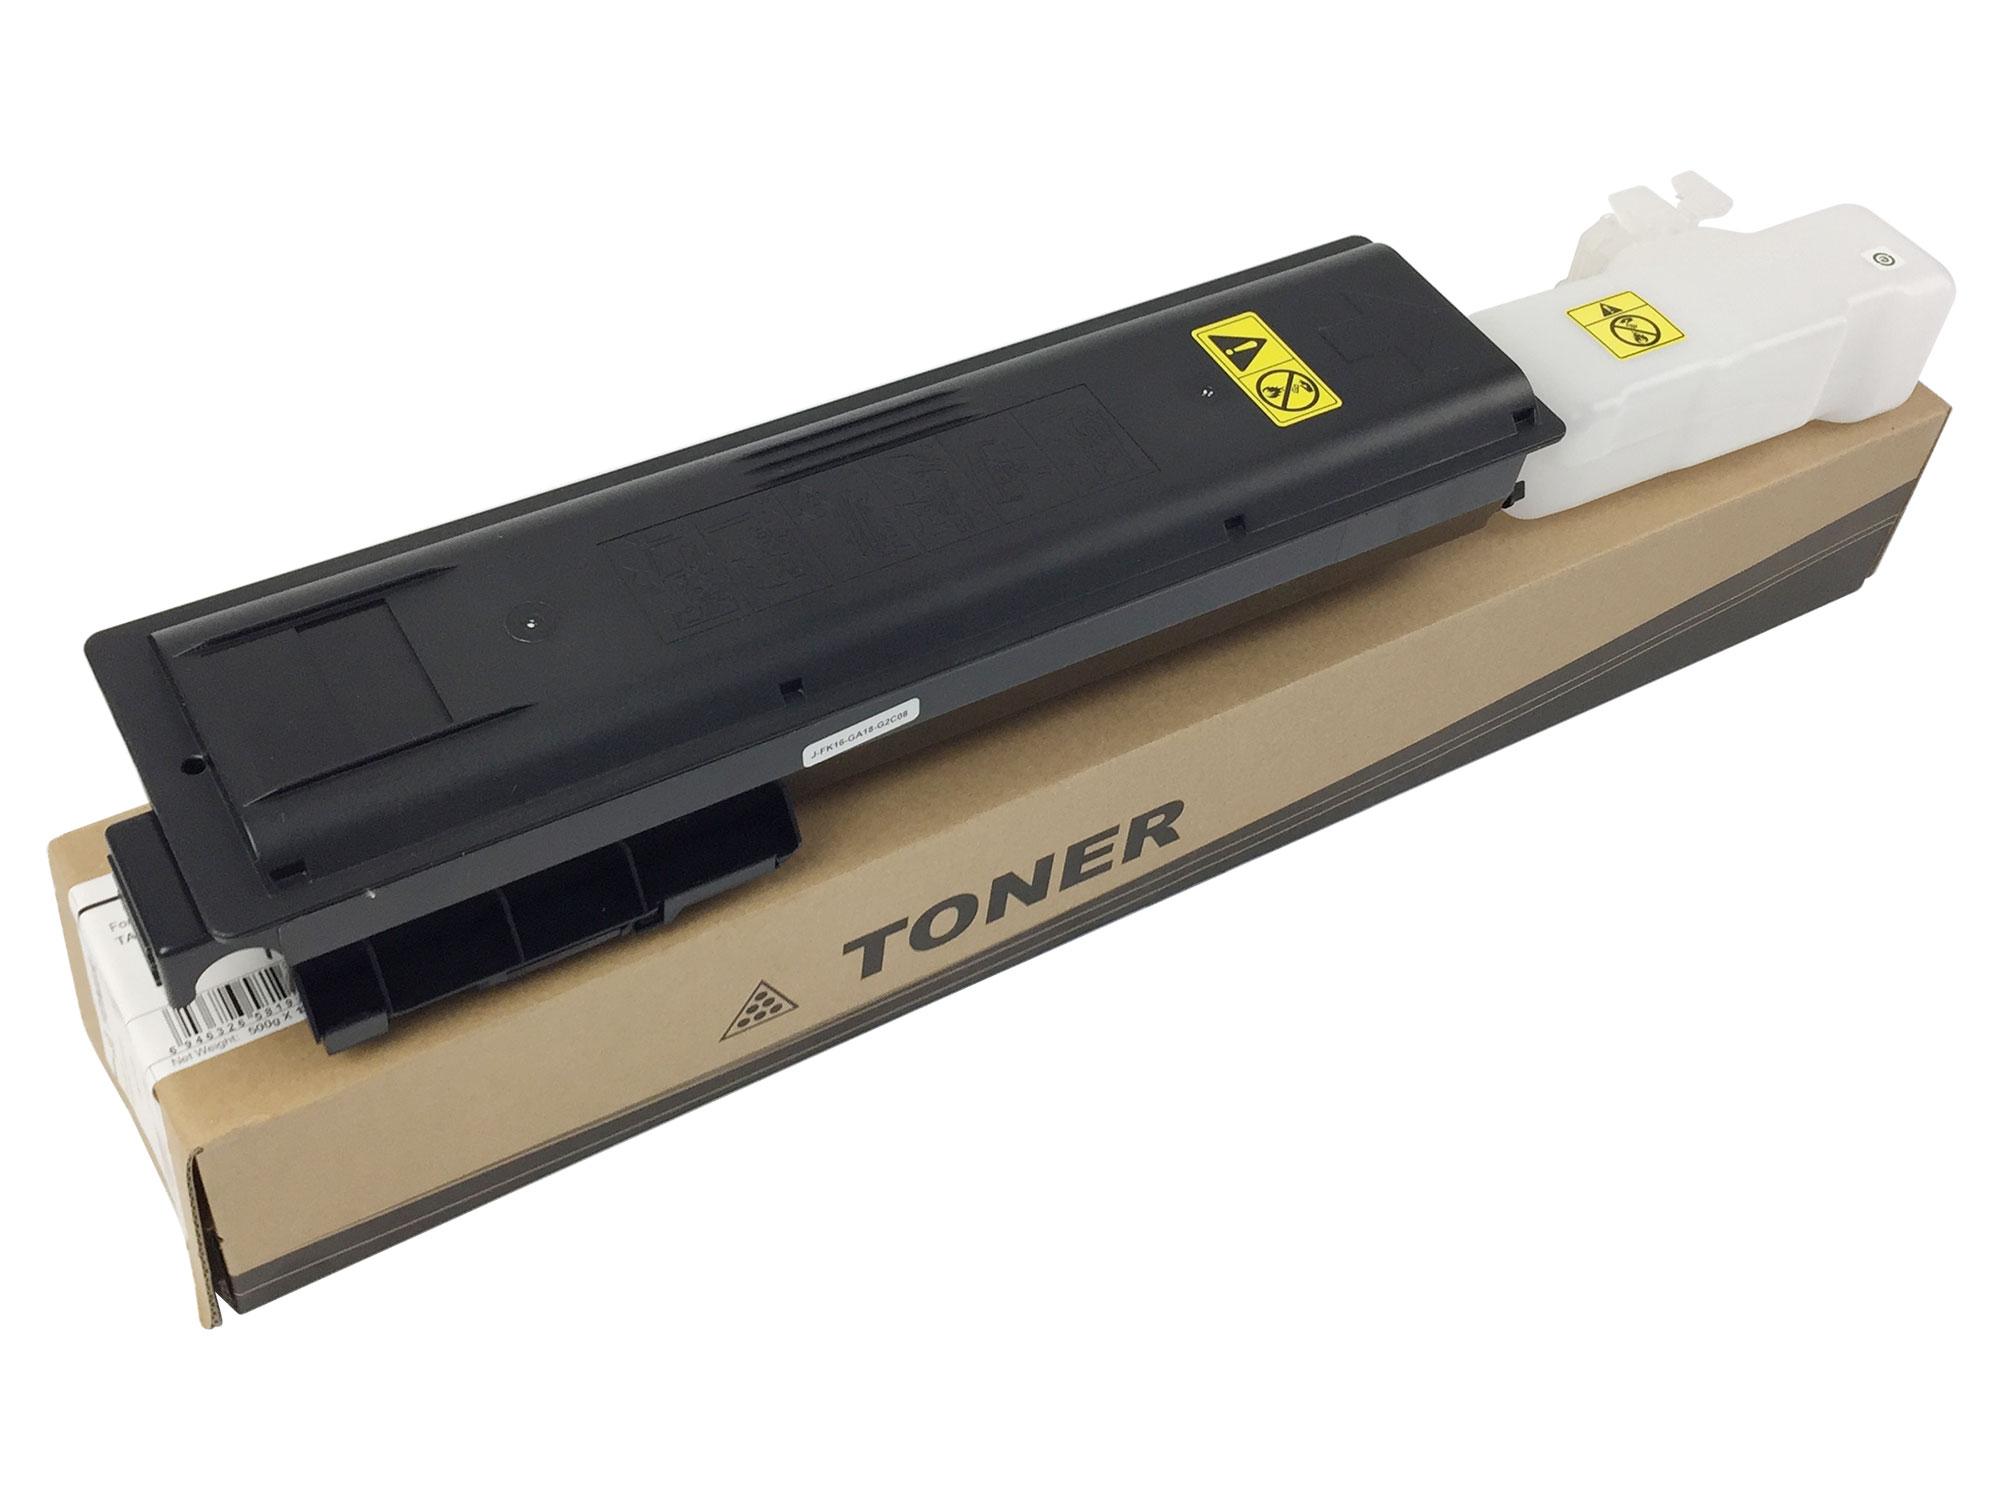 TK-4108 Toner Cartridge for Kyocera TASKalfa 1800